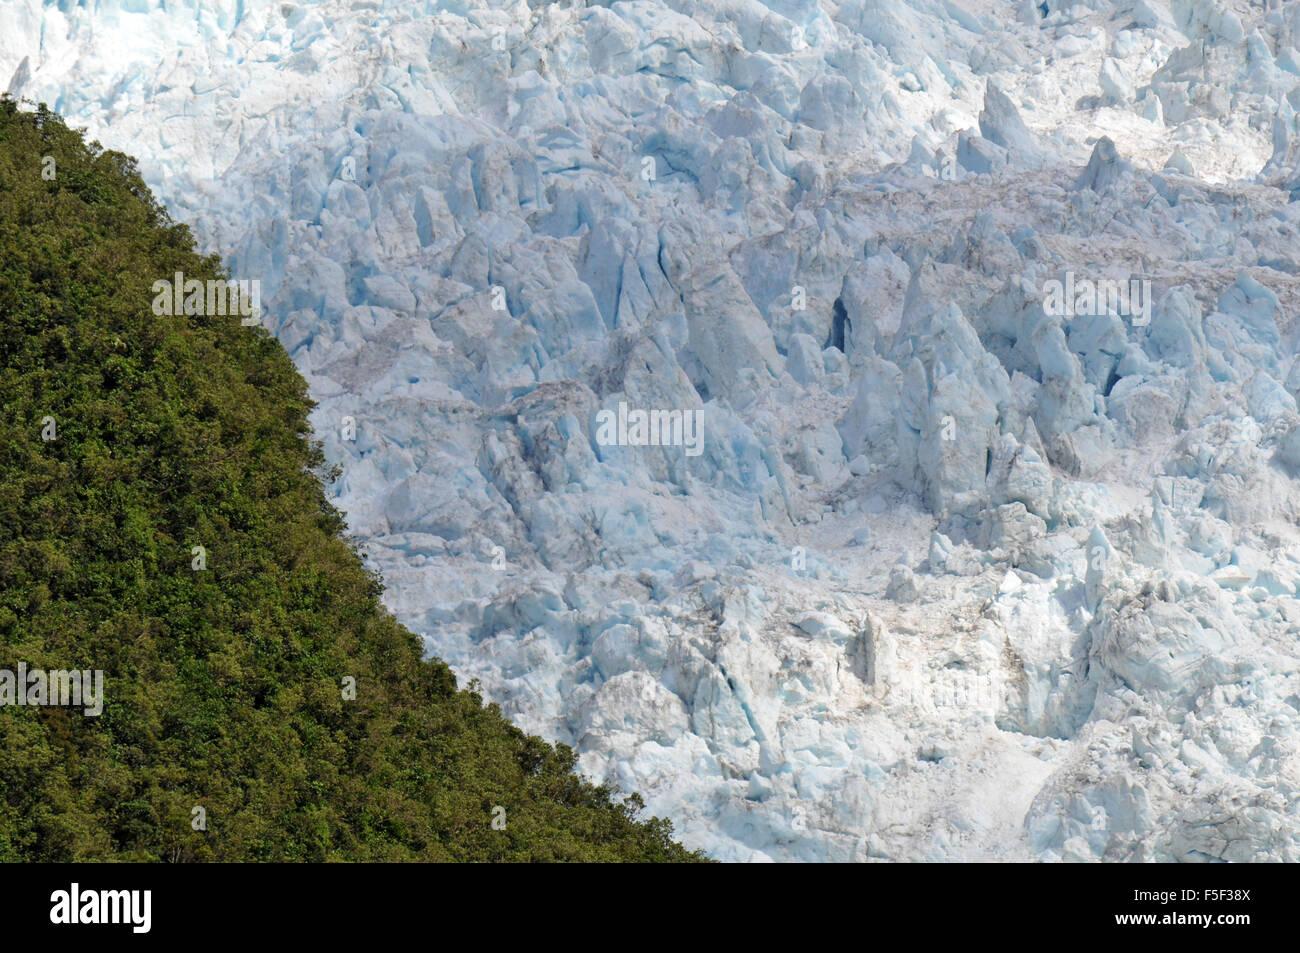 Franz Josef Glacier, a glacier melting due to climate change, Franz Josef, South Island, New Zealand Stock Photo